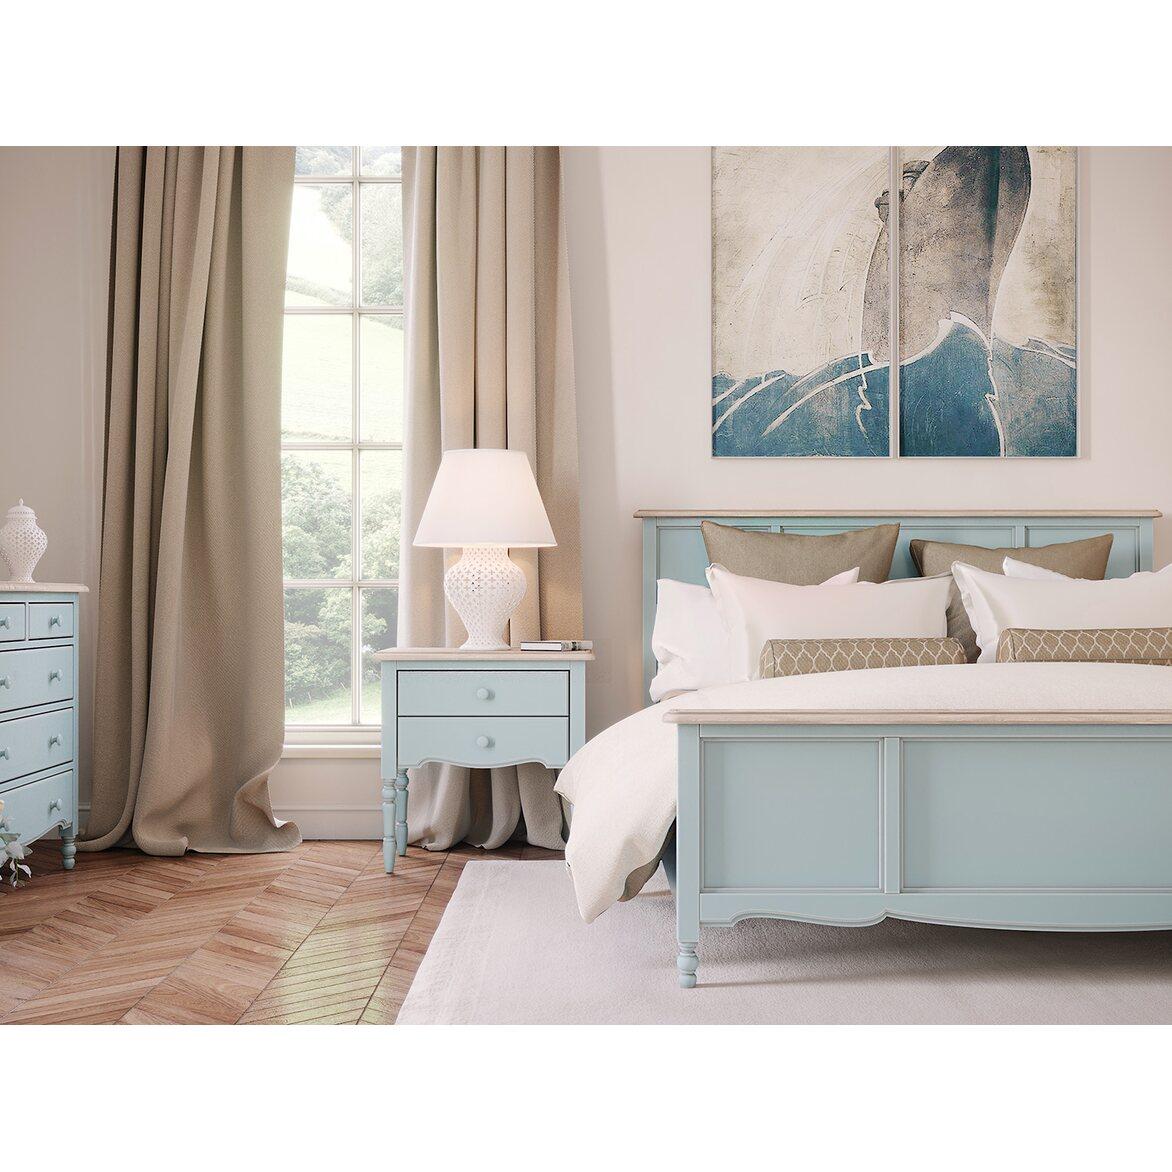 Шкаф трехстворчатый Leblanc, голубой 5   Платяные шкафы Kingsby